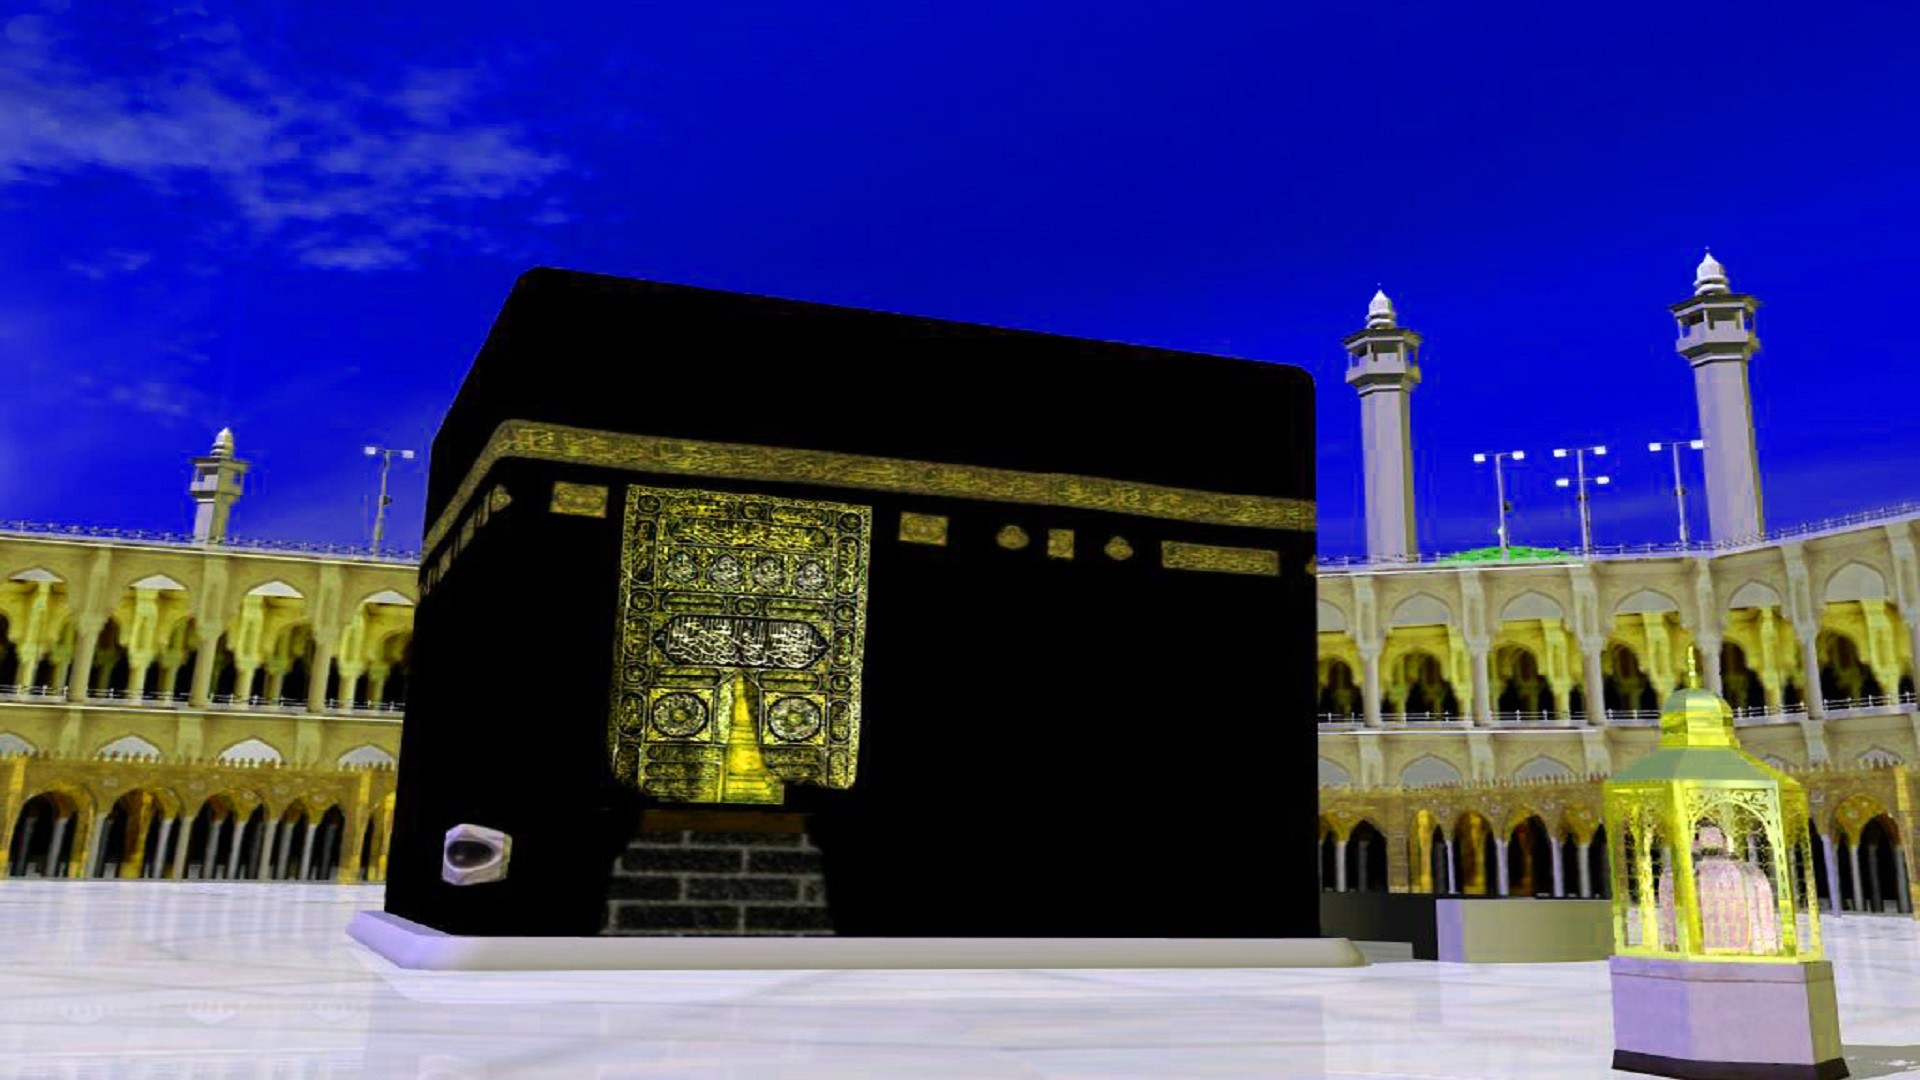 3d Wallpaper Mobile9 Download Mecca Hd Wallpaper 70 Images